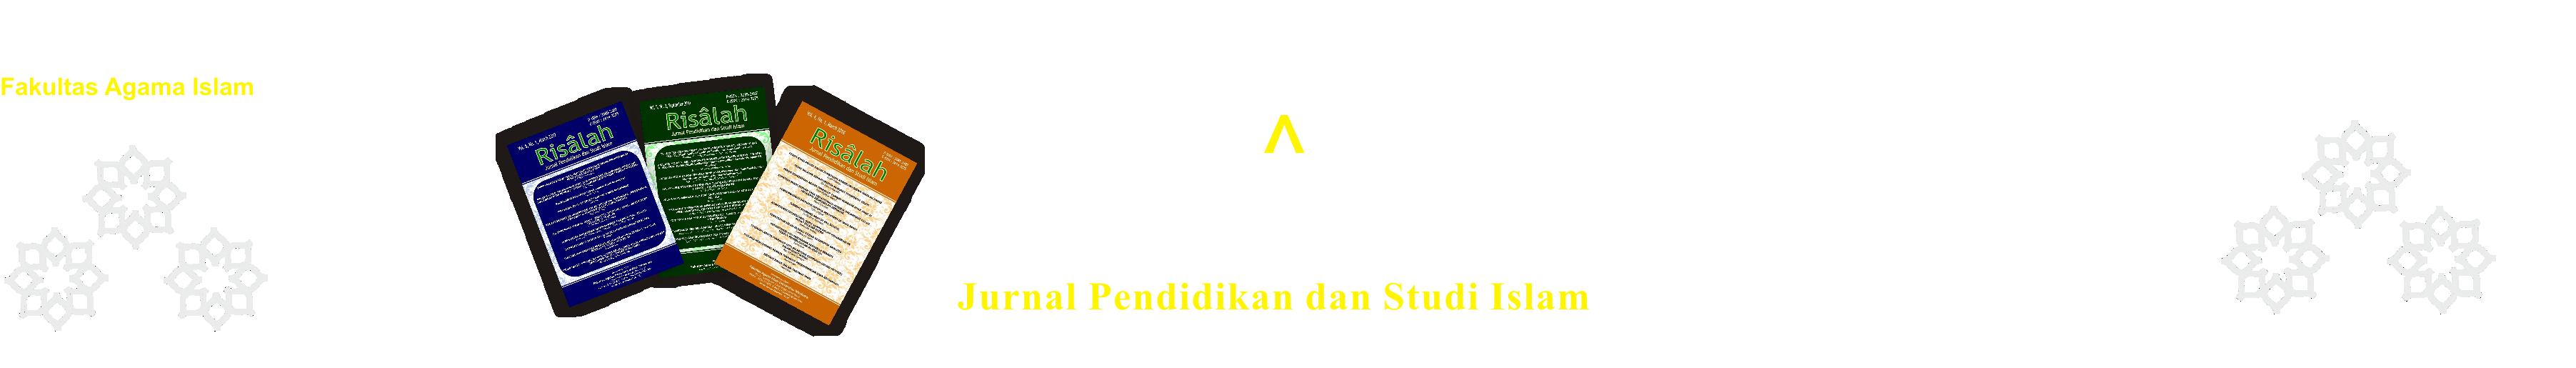 Risalah, Jurnal Pendidikan dan Studi Islam